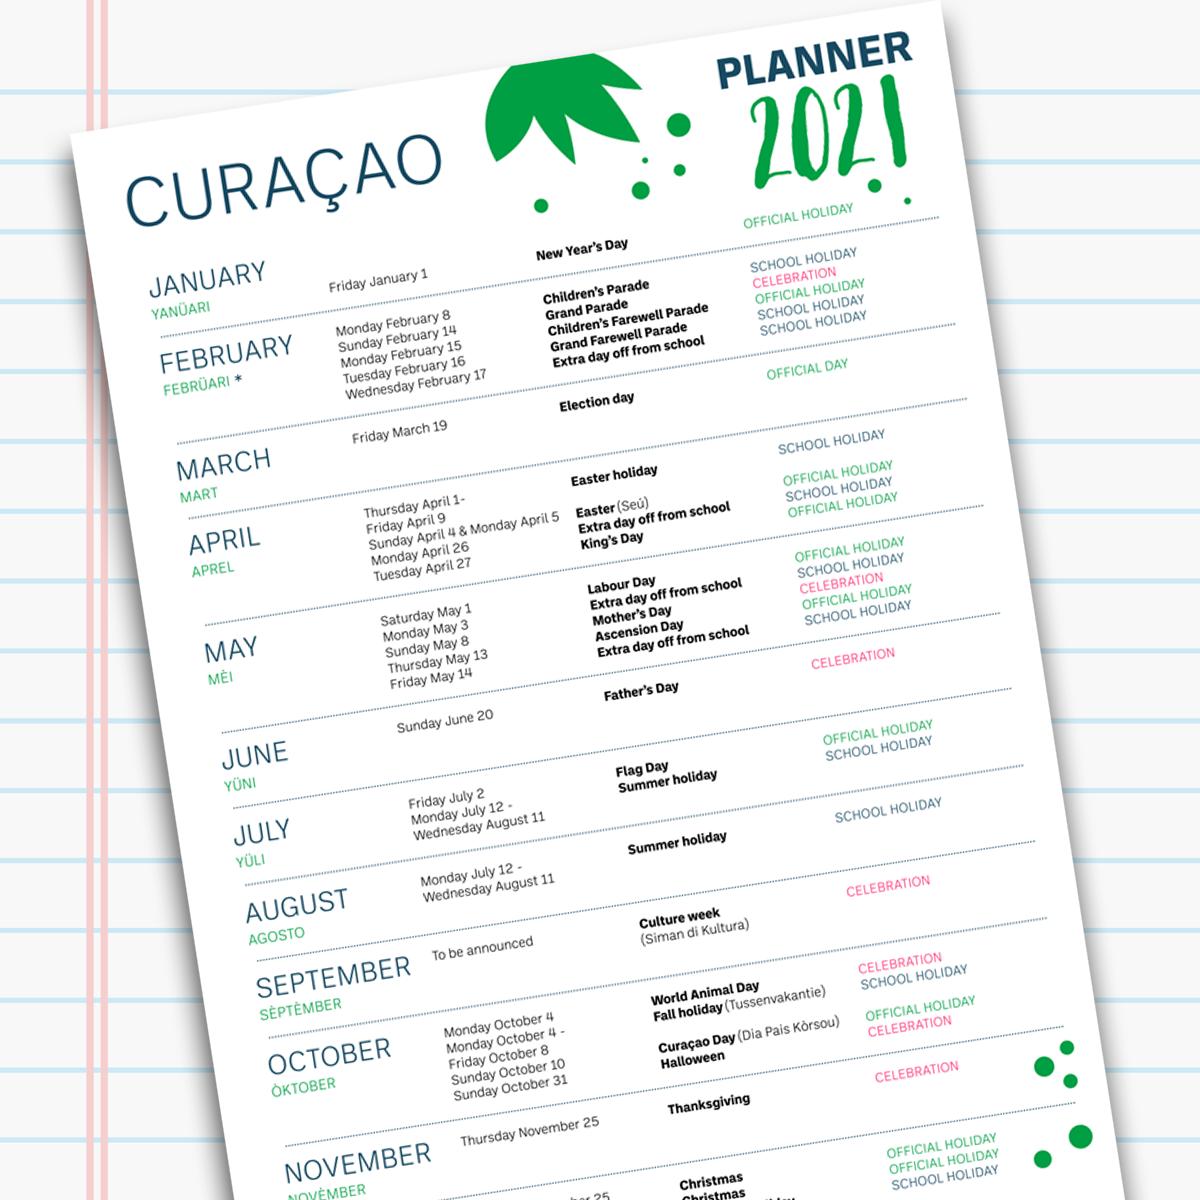 Calendar Curacao 2021